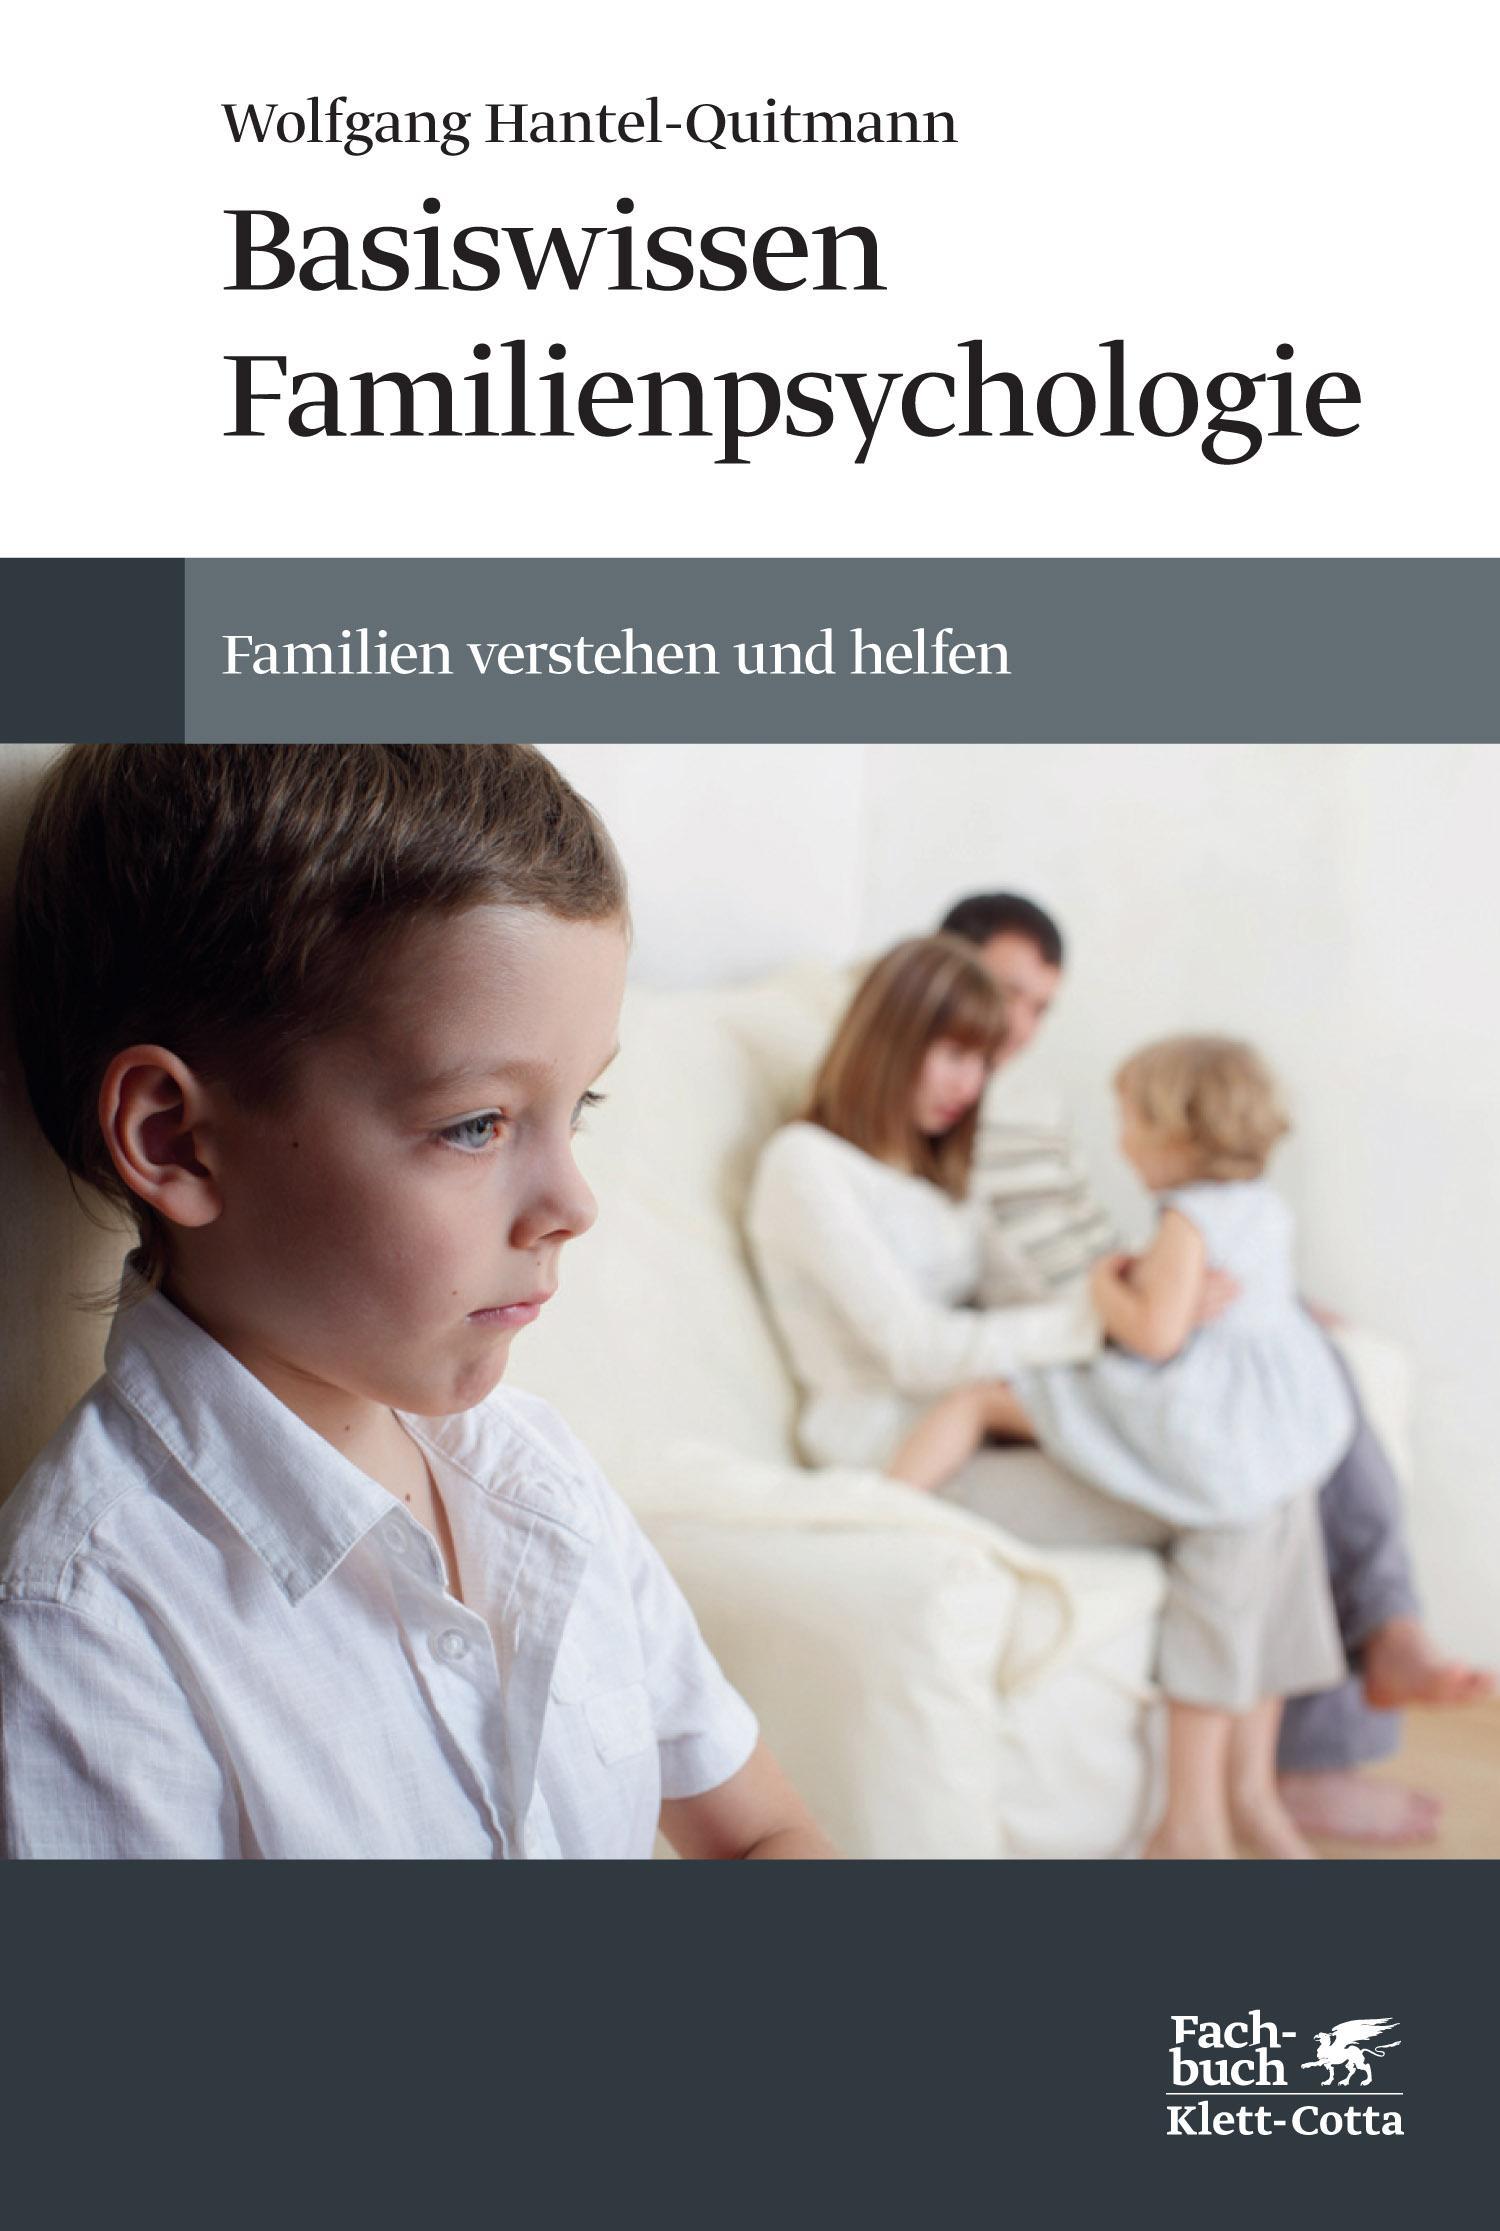 Basiswissen-Familienpsychologie-Wolfgang-Hantel-Quitmann